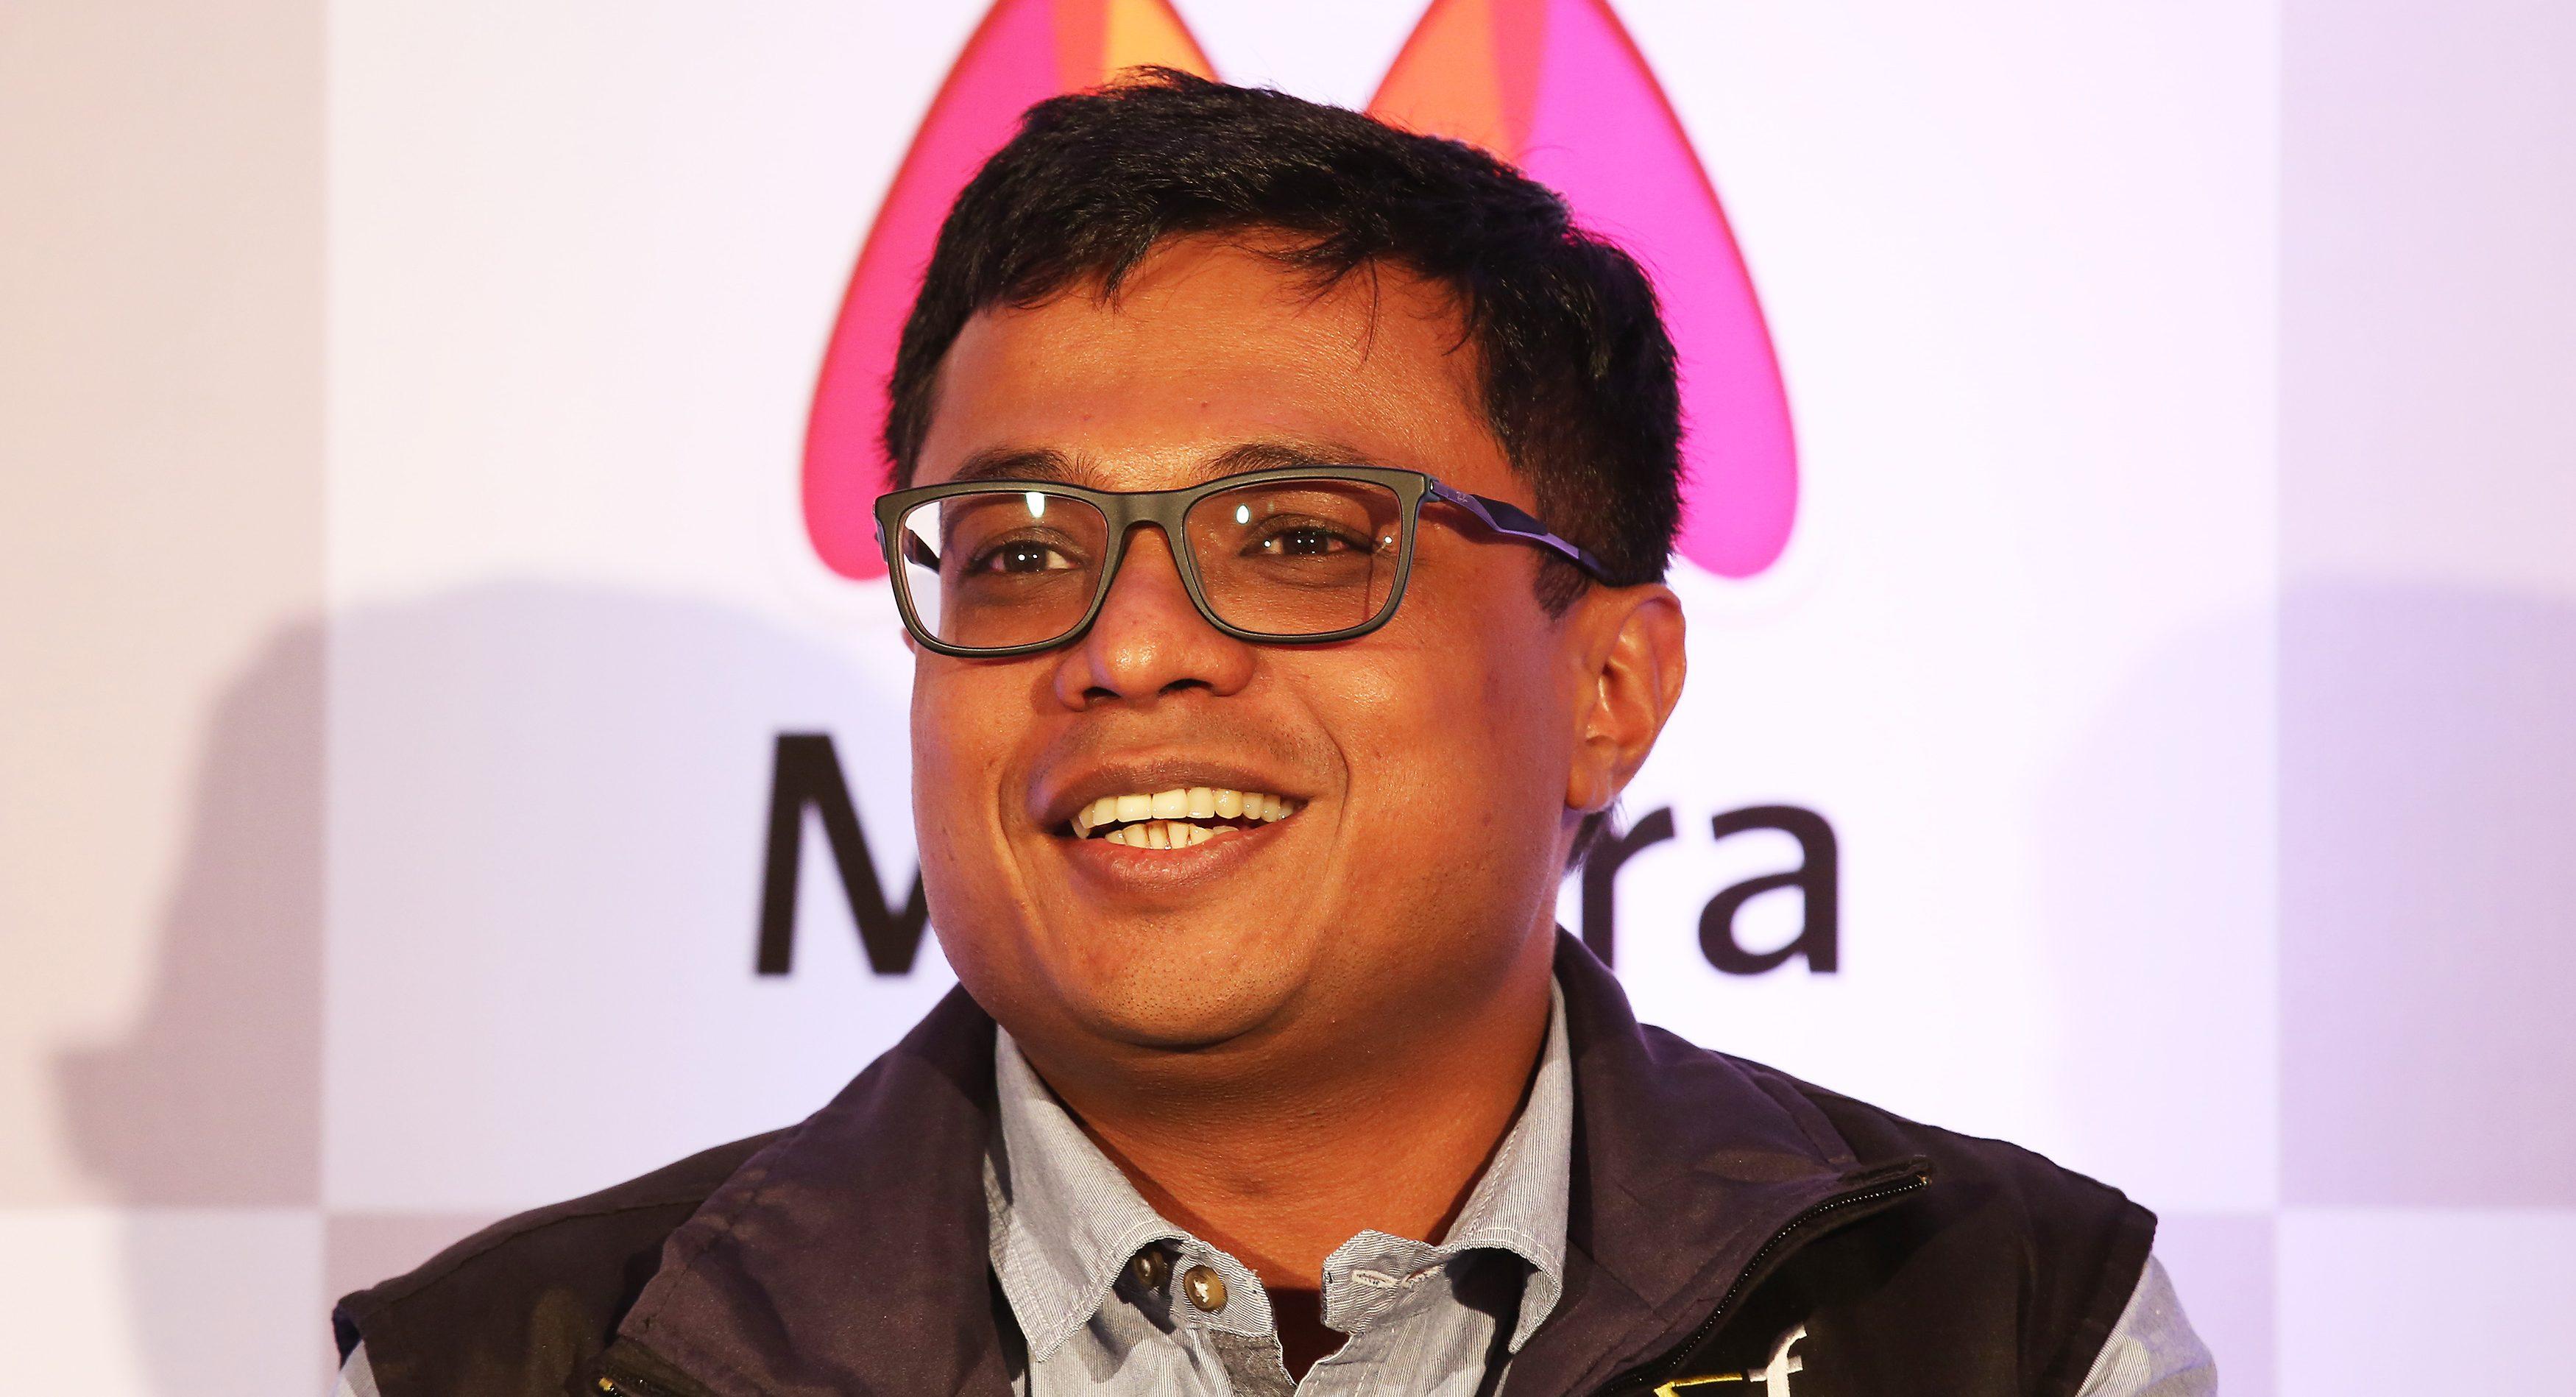 India-Flipkart-Sachin-Bansal-Startup-Twitter